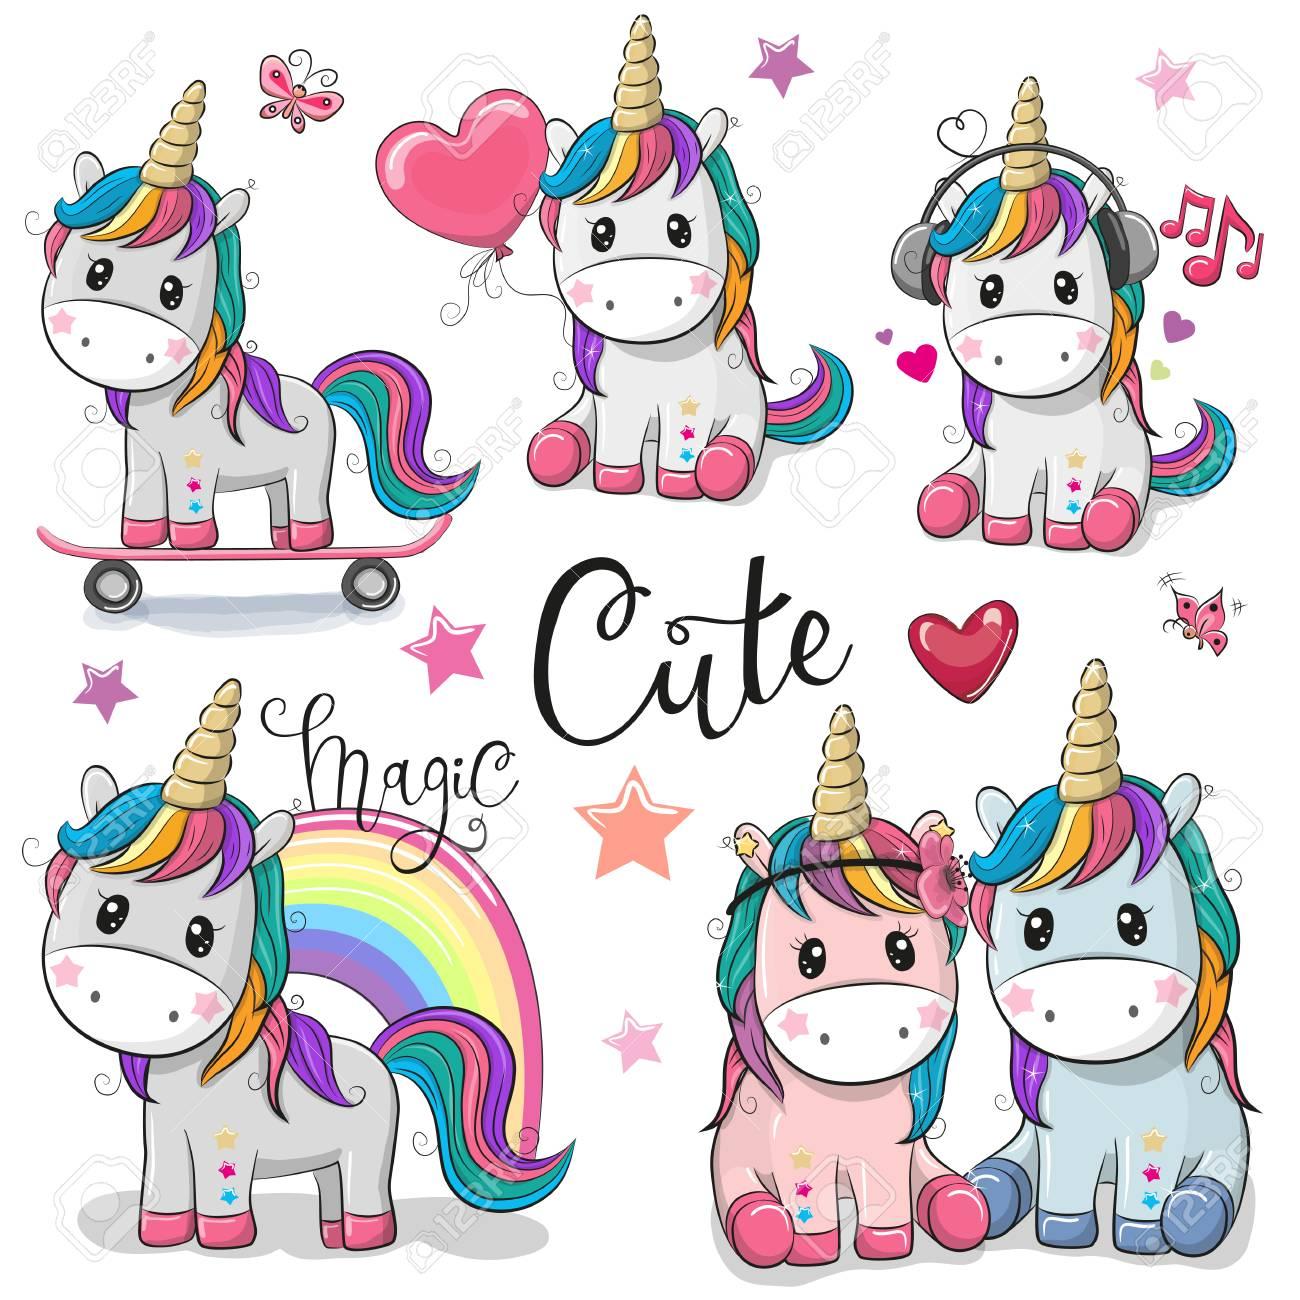 Set of Cute Cartoon Unicorns isolated on a white background - 98834943